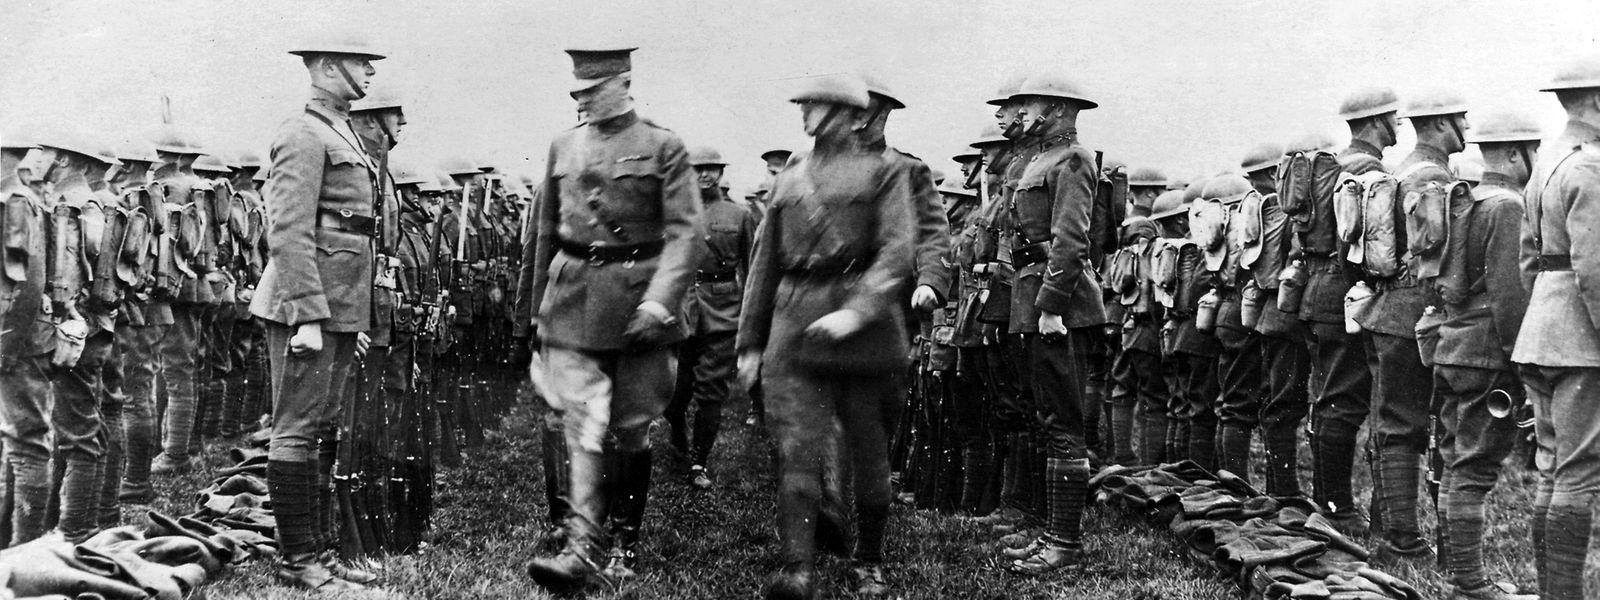 General John Pershing 1918 in Esch/Alzette